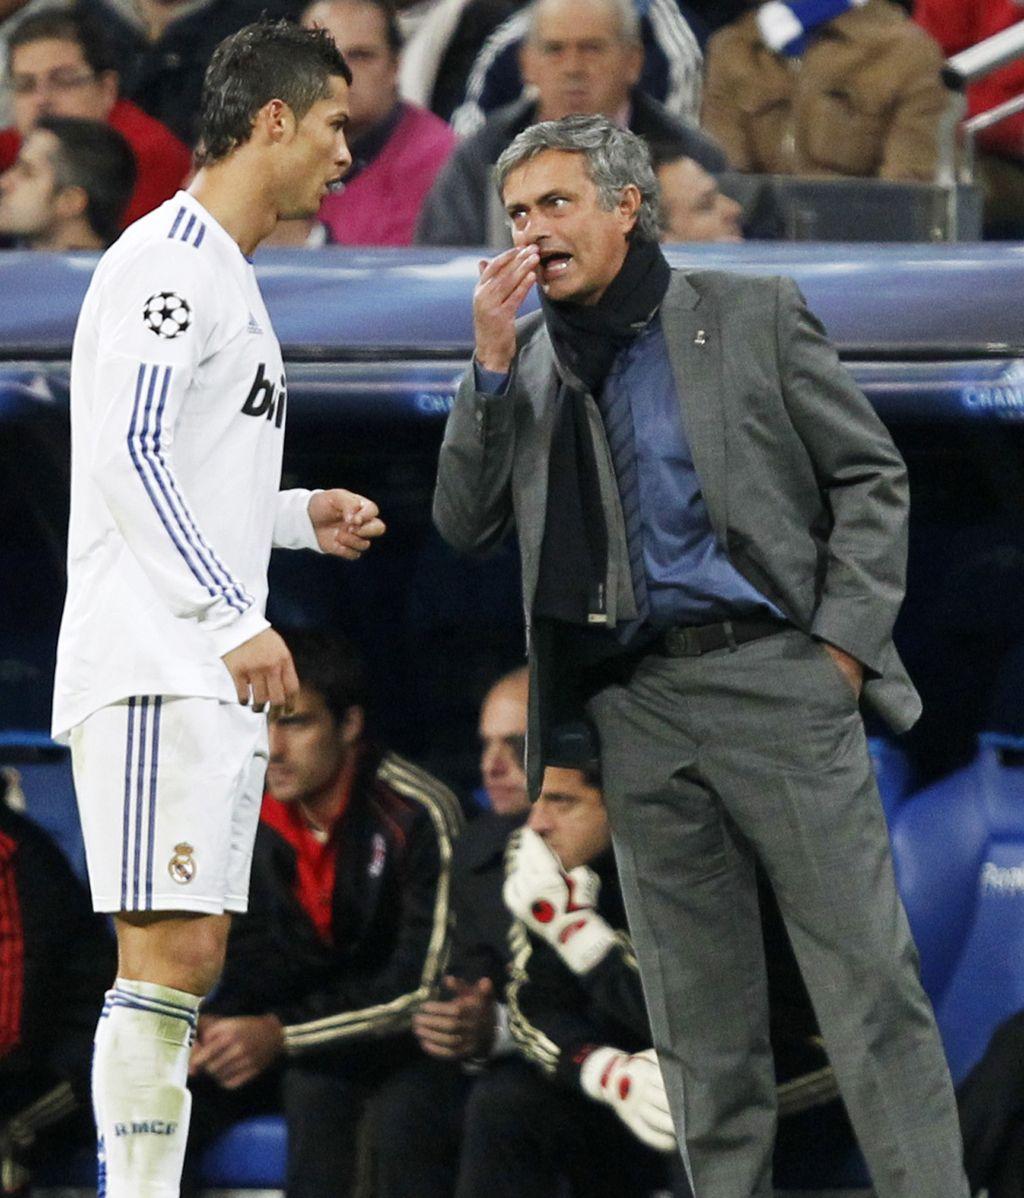 José Mourinho da instrucciones a Cristiano Ronaldo durante un partido